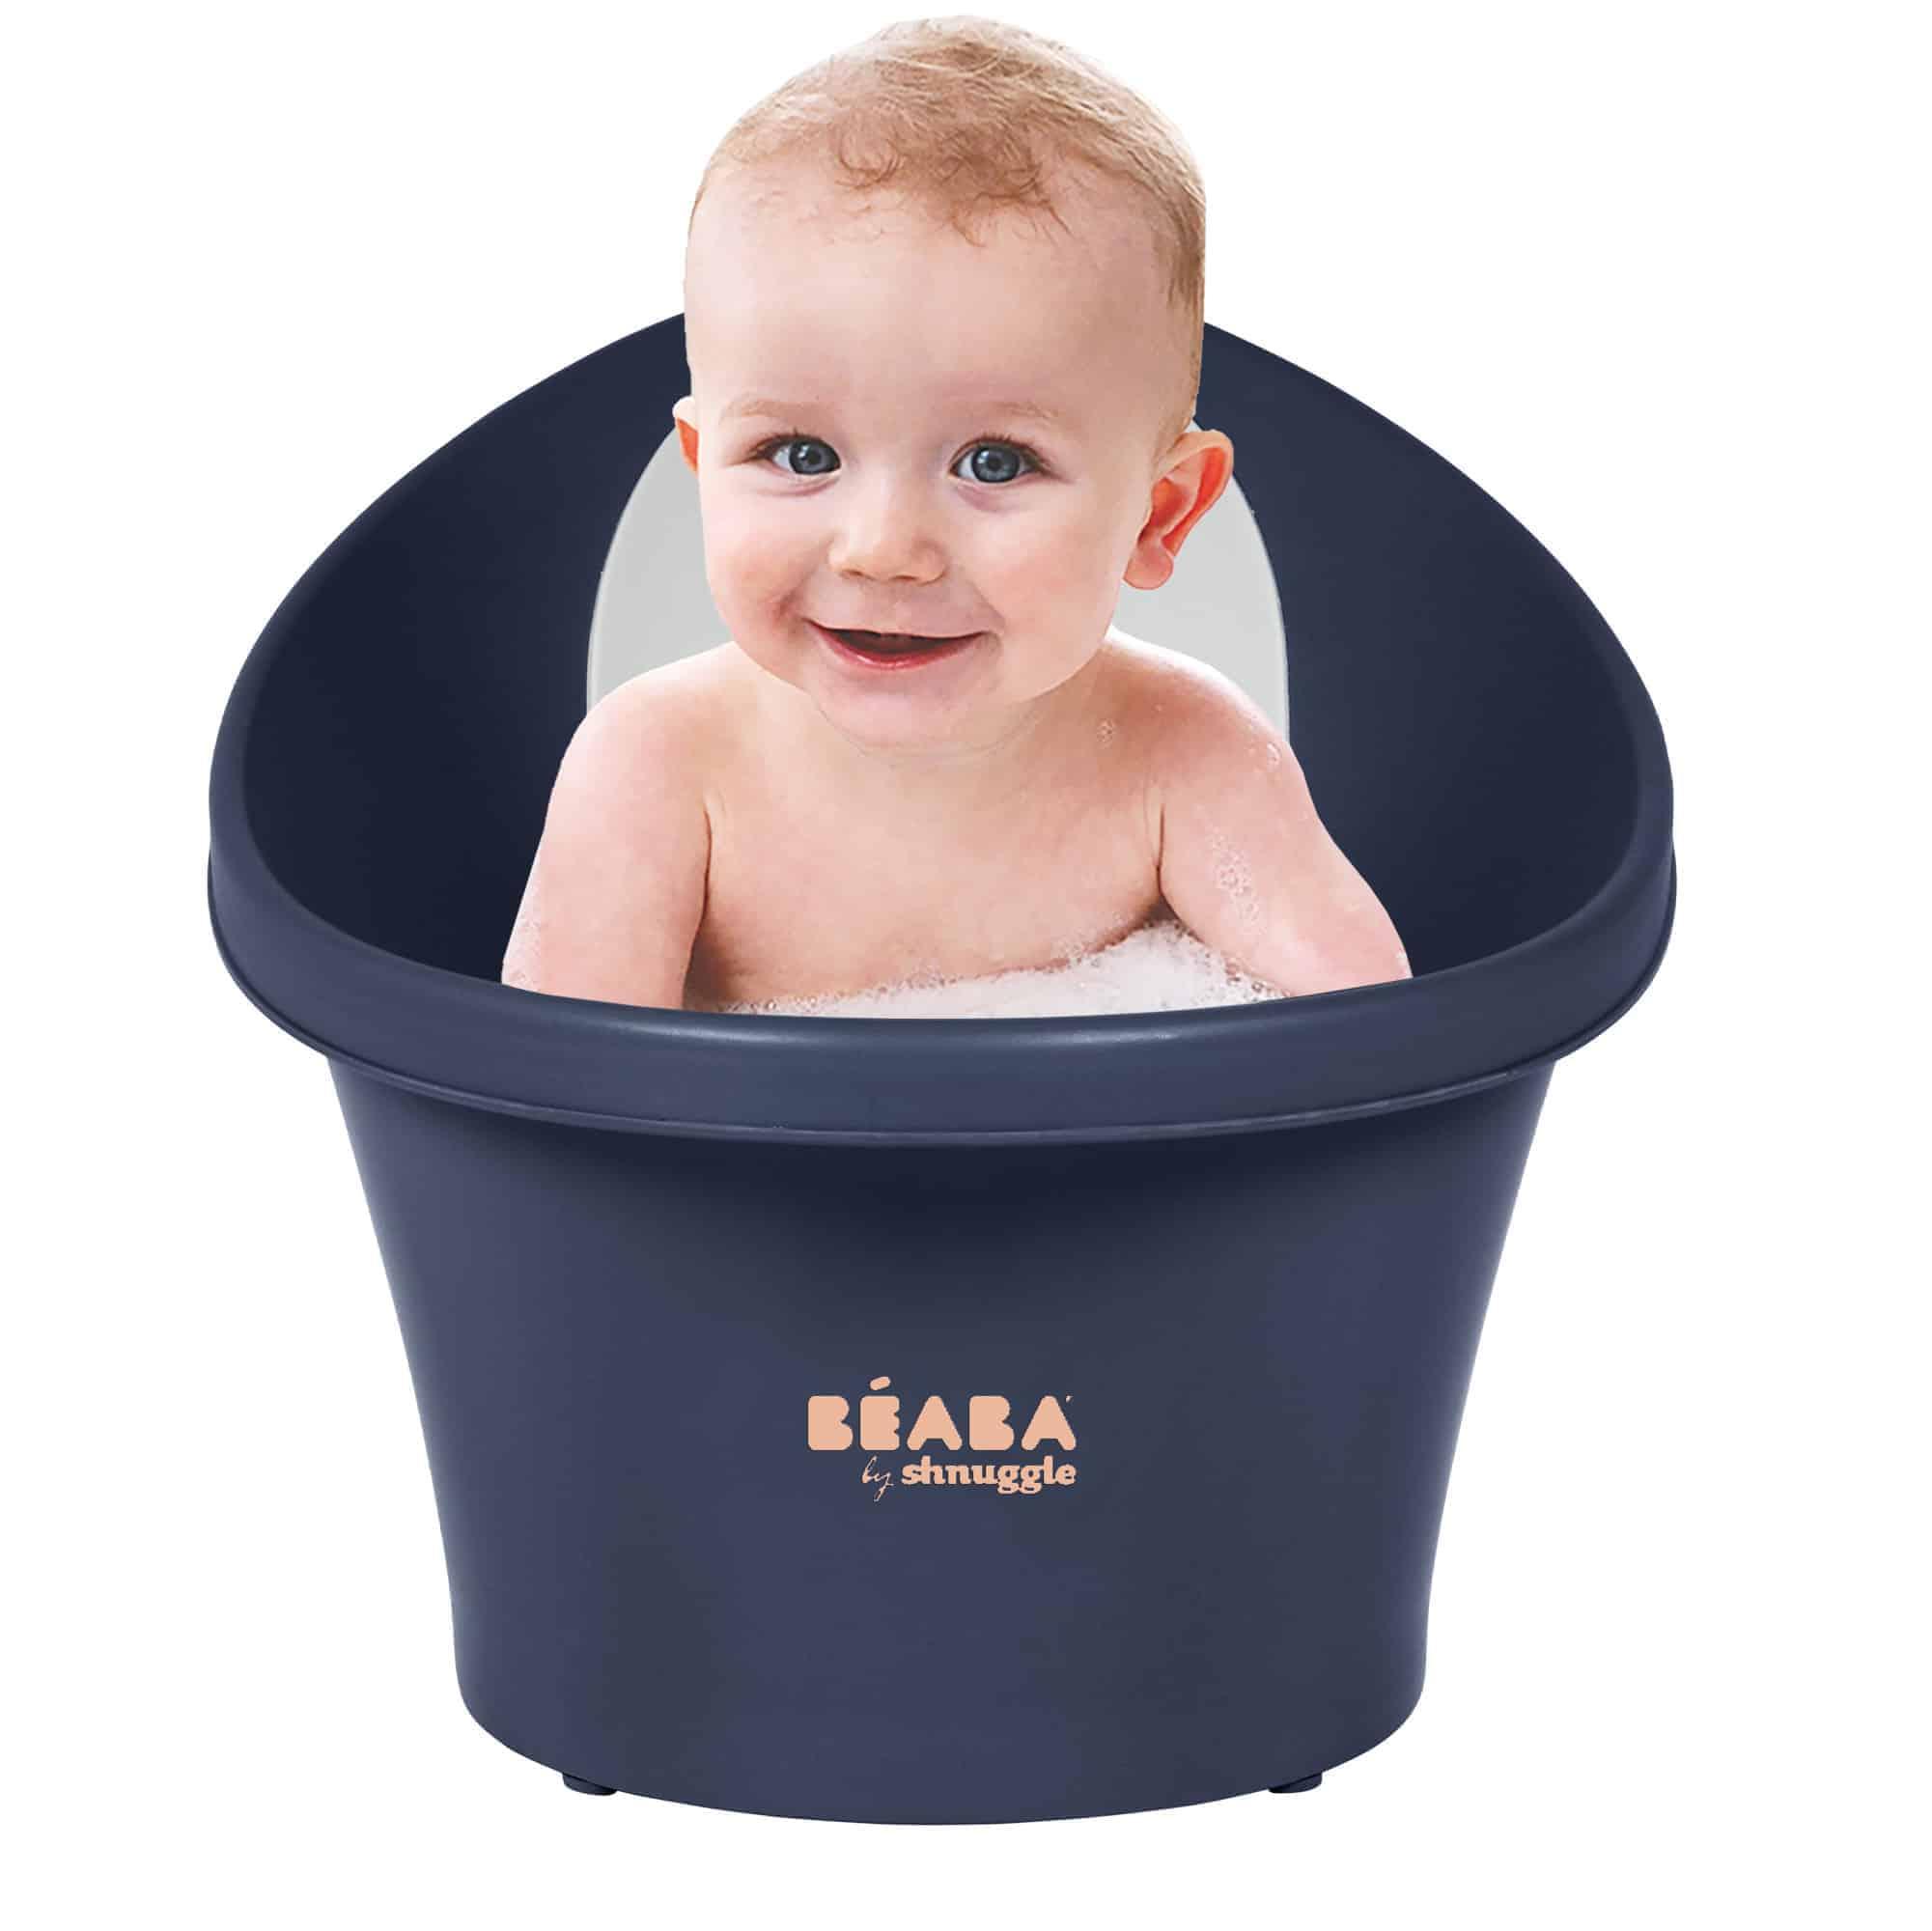 Midnight bath with baby